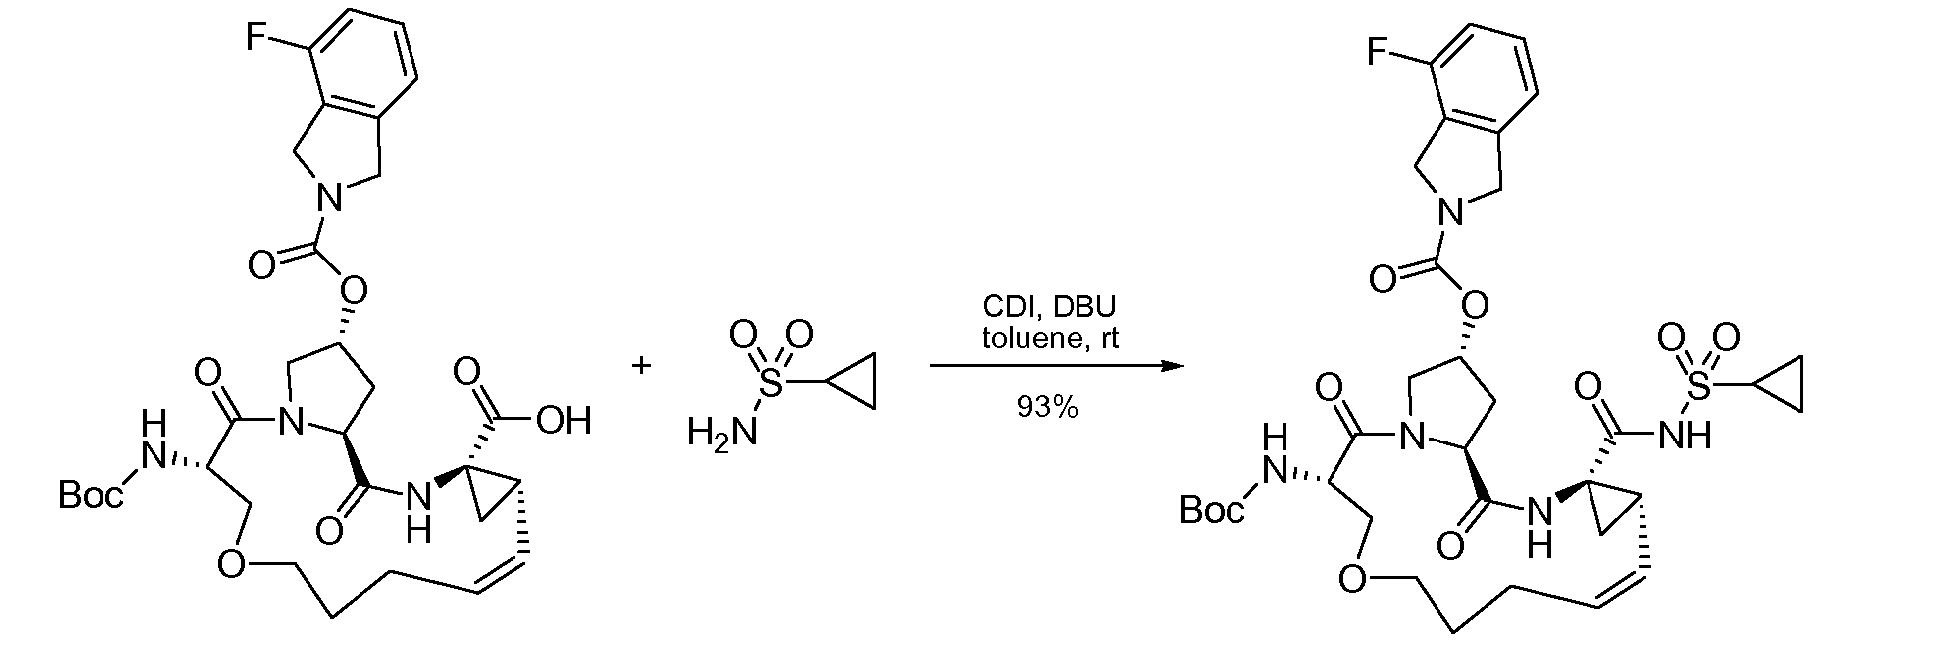 Figure imgb0503